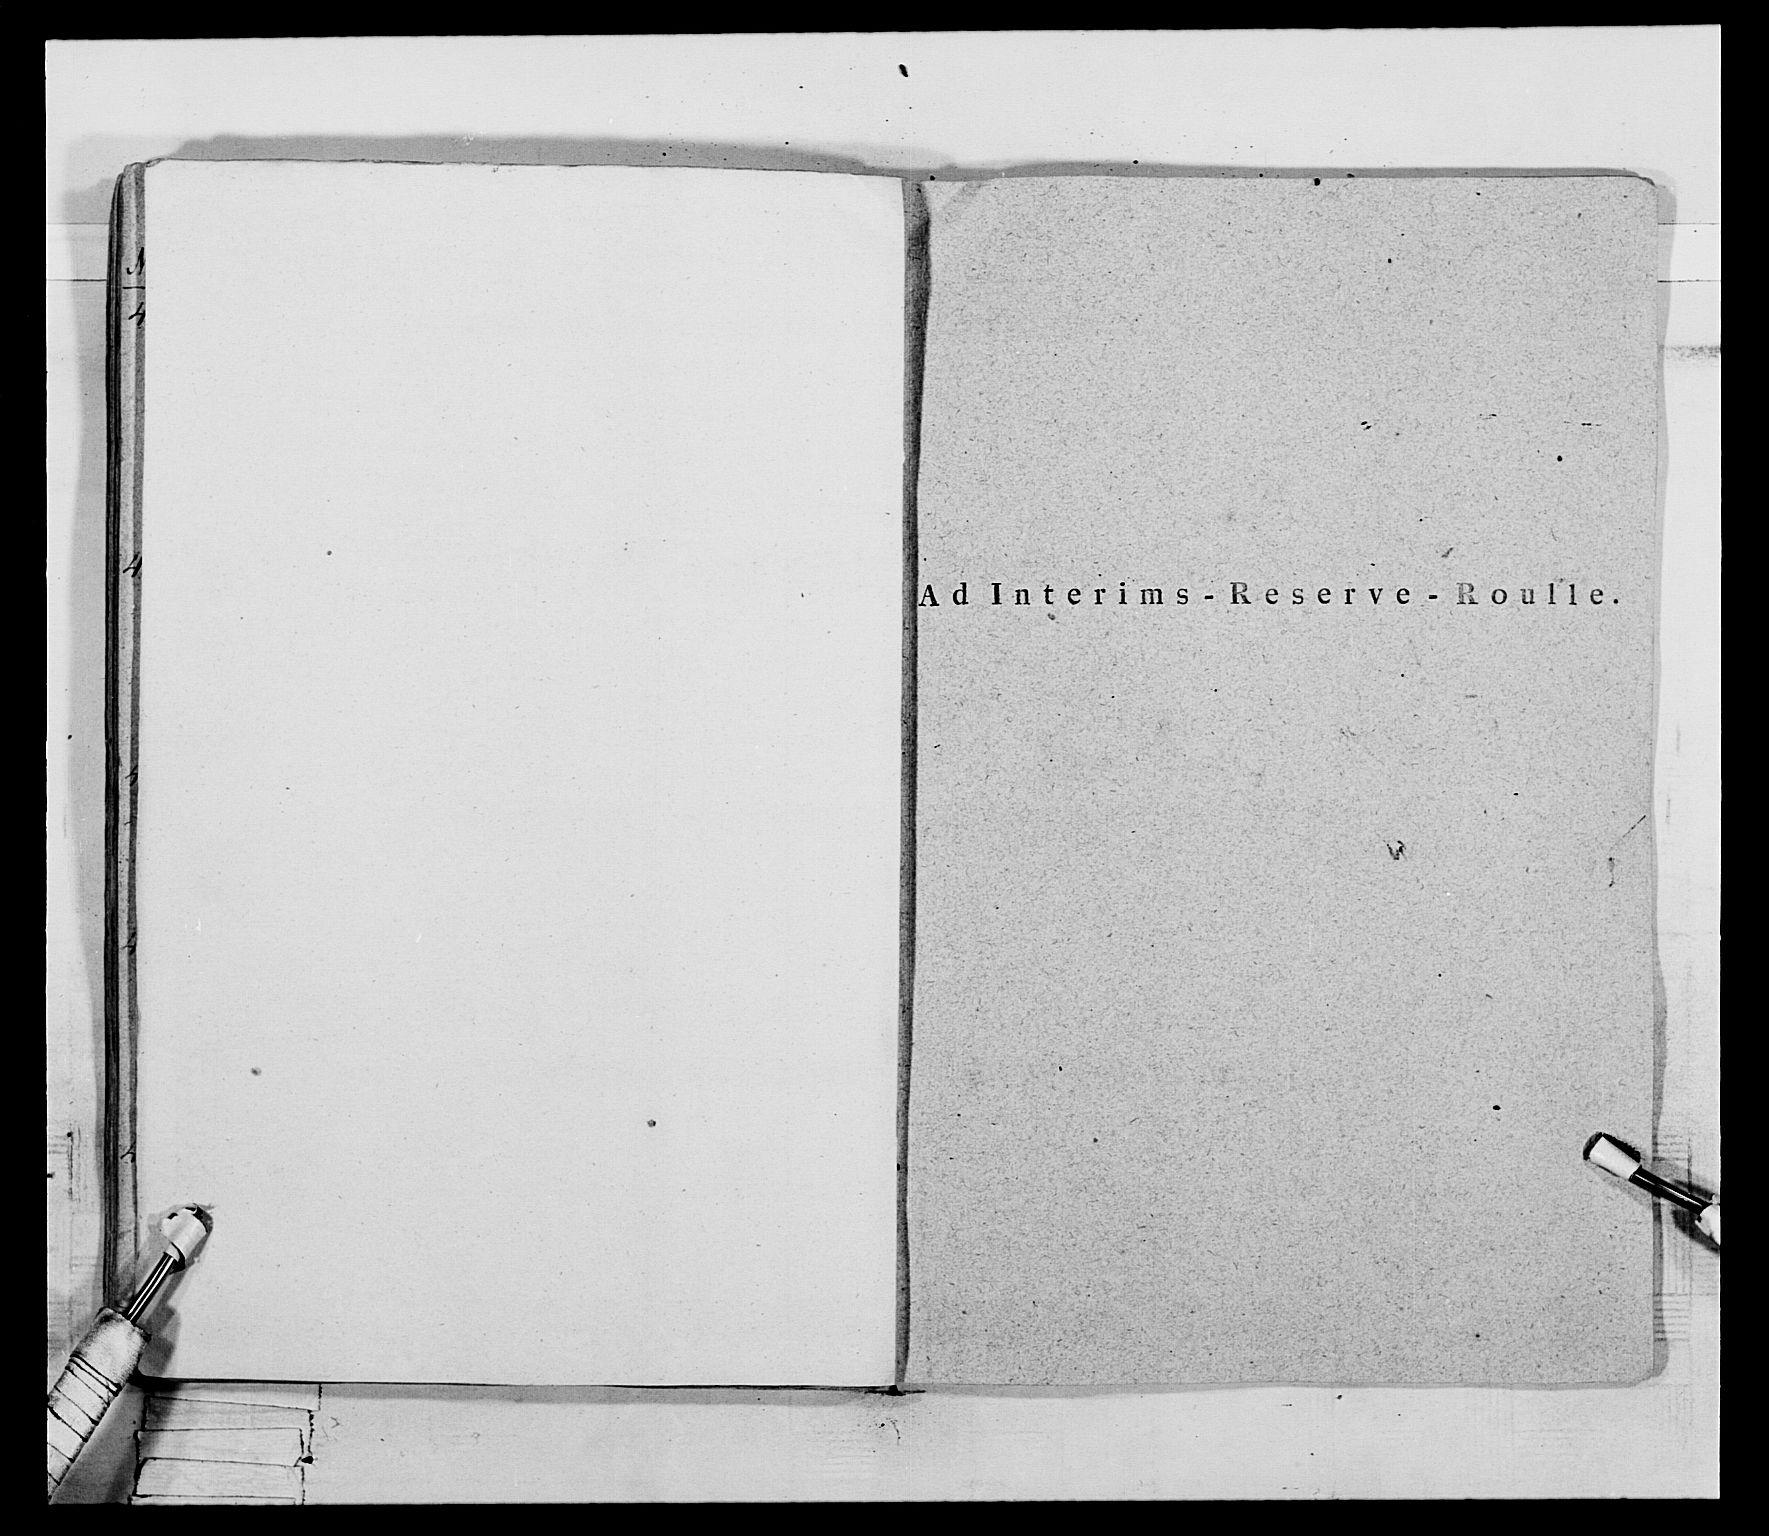 RA, Generalitets- og kommissariatskollegiet, Det kongelige norske kommissariatskollegium, E/Eh/L0069: Opplandske gevorbne infanteriregiment, 1810-1818, p. 47